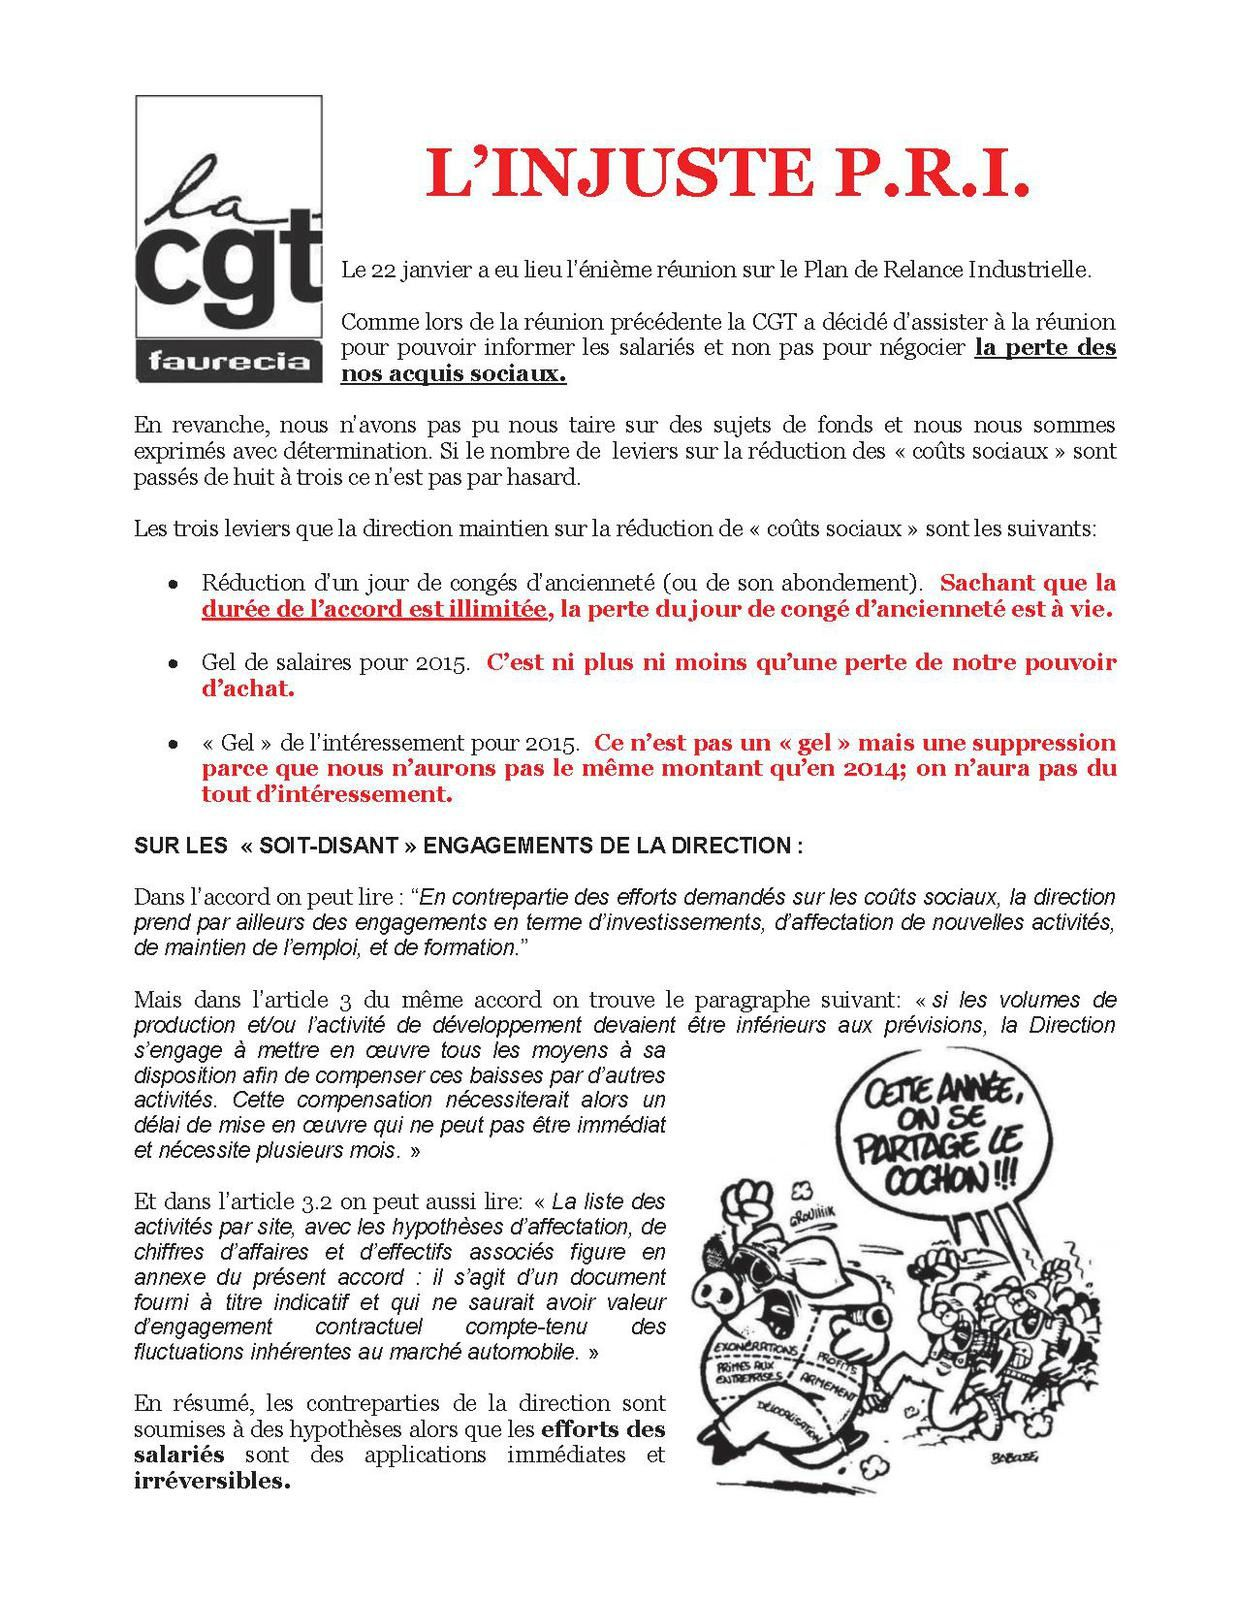 L'INJUSTE P.R.I. (tract contre l'accord compétitivité)